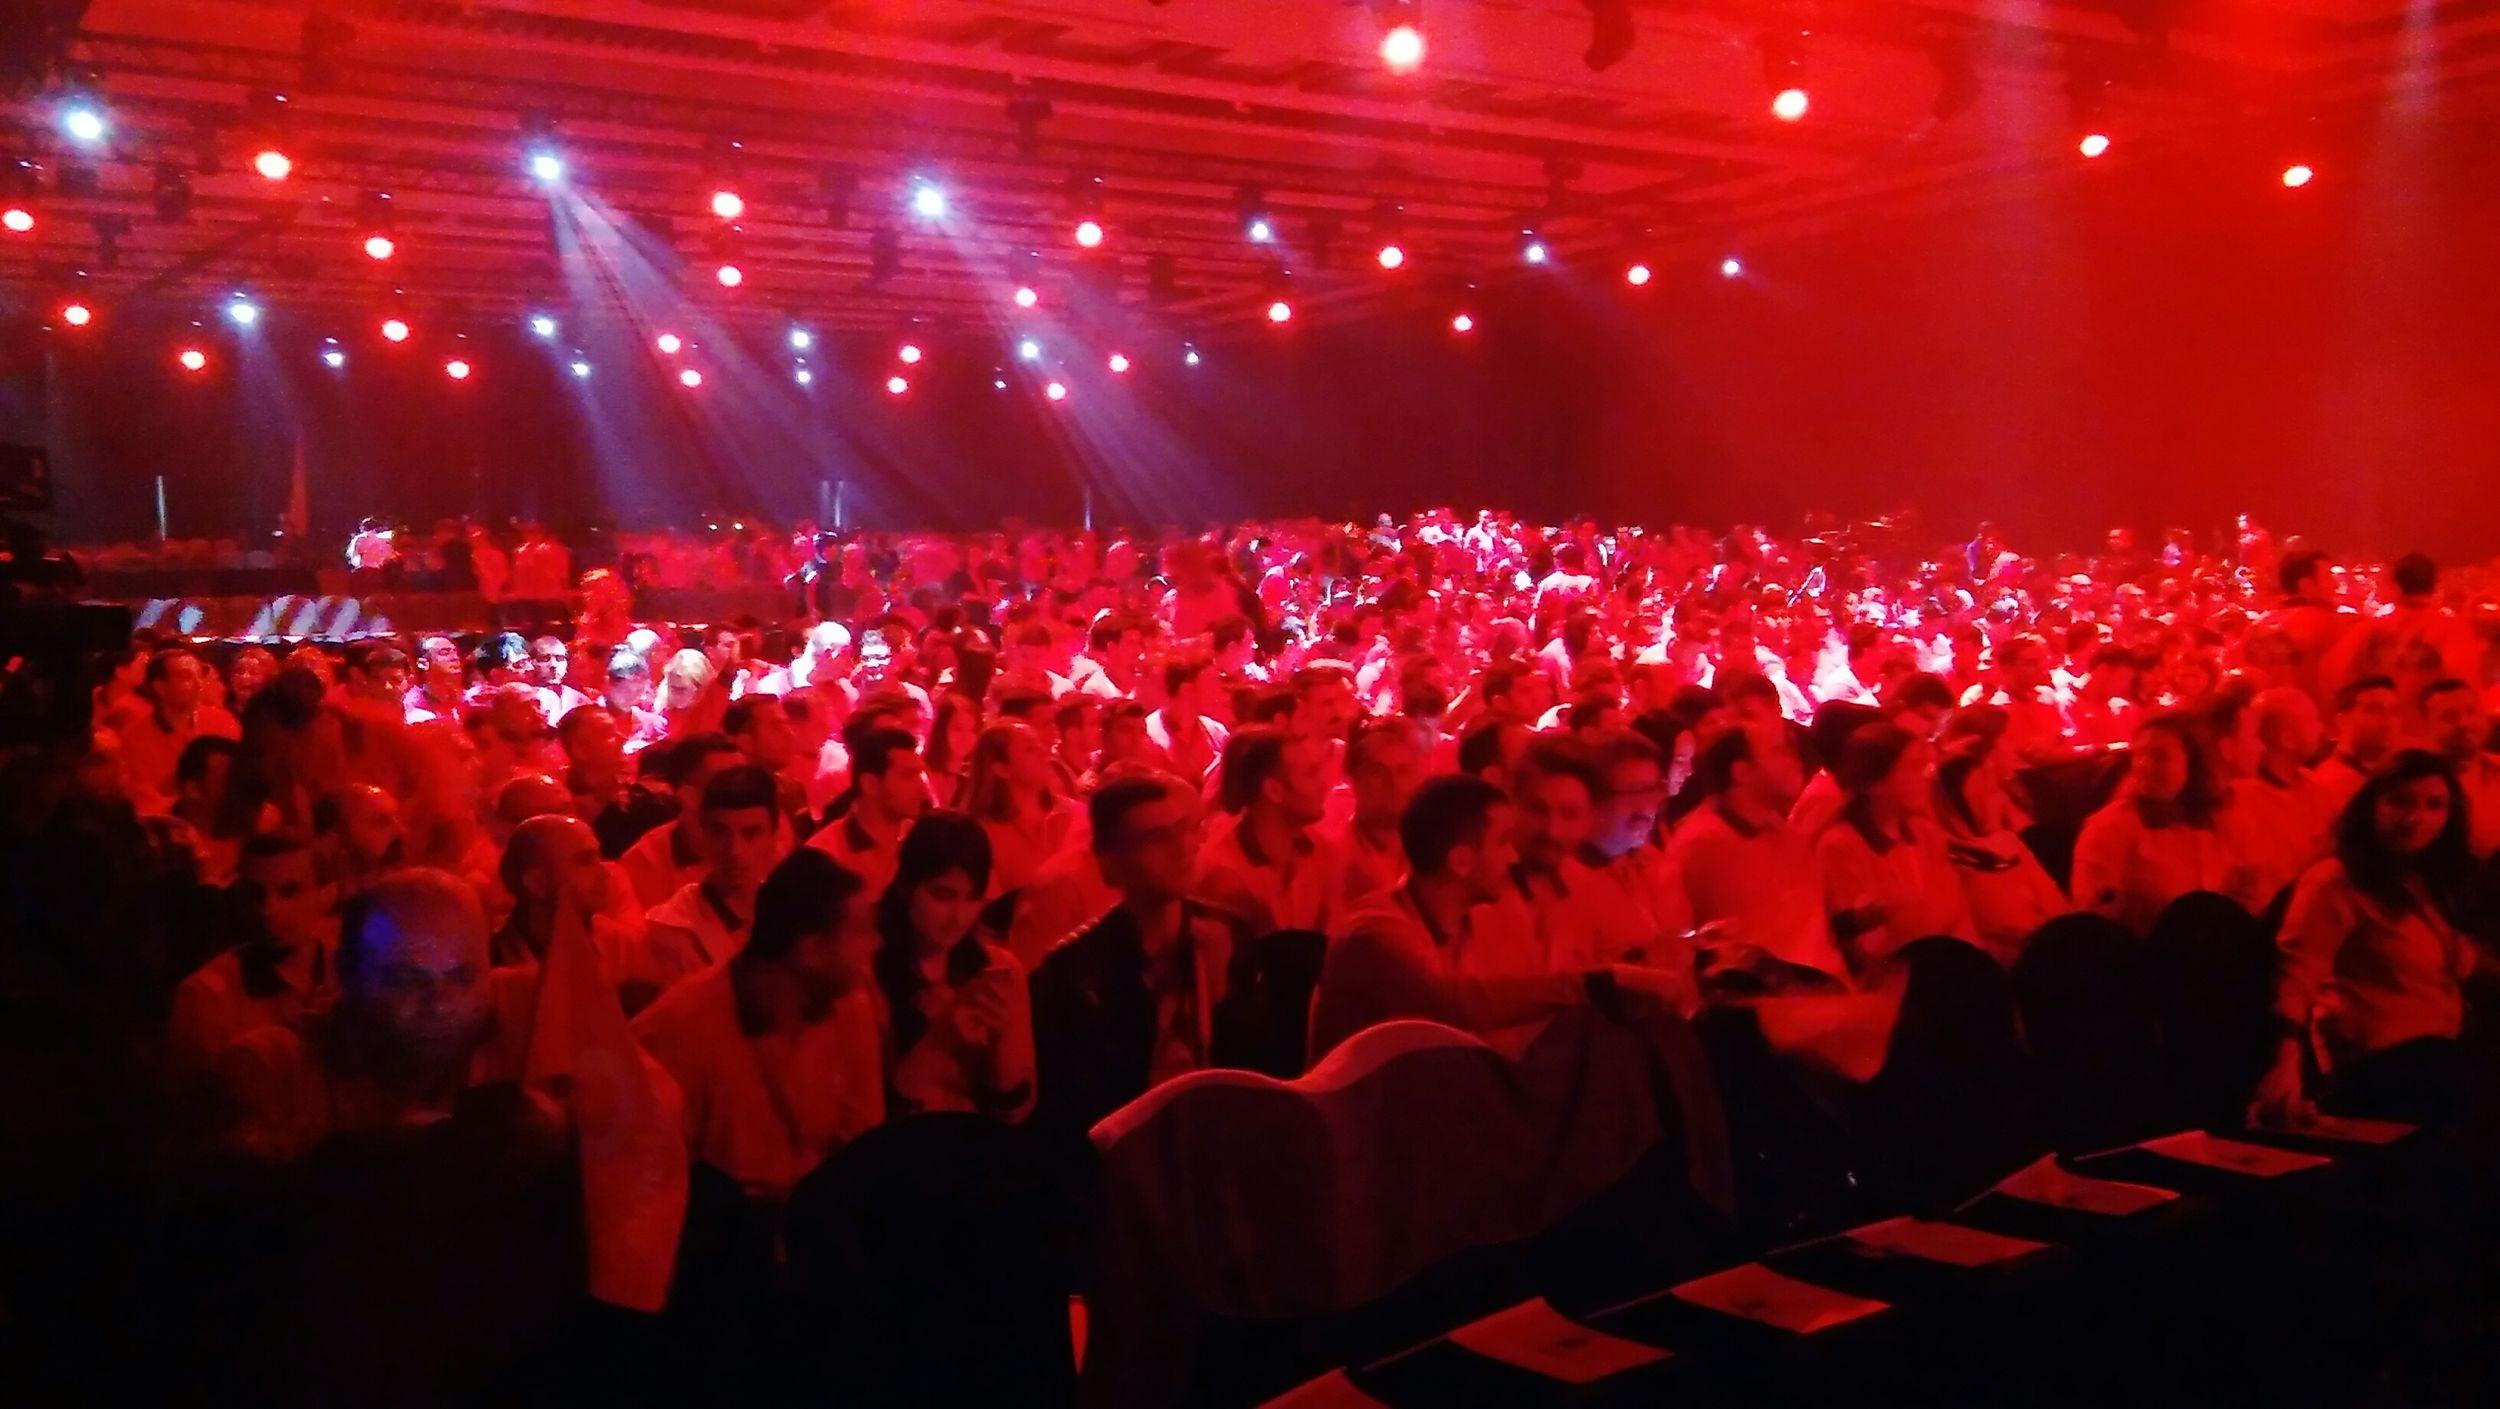 Vodafone  Antalya Belek Sueno Hotels Bolge Toplantısı Organization Red People Checking In EyeEm Best Shots Likemeplease Bendenbirkare Benimgözümden Benimkadrajim Likeme Followme Hi! Relaxing Hello World Cheese! EyeEm